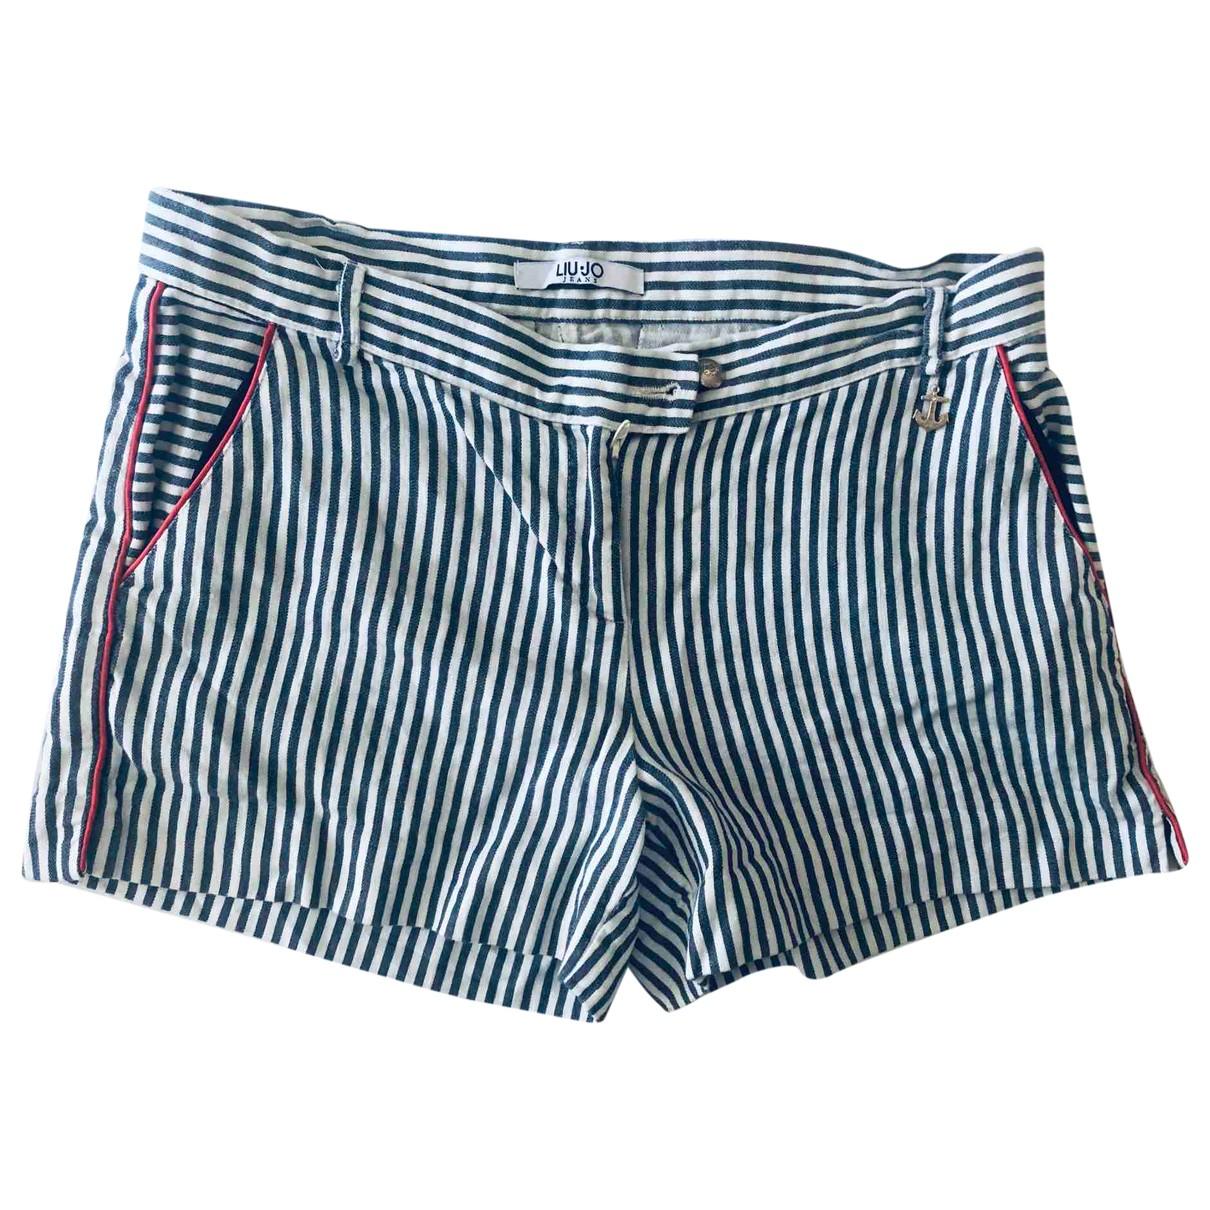 Liu.jo \N Shorts in  Blau Baumwolle